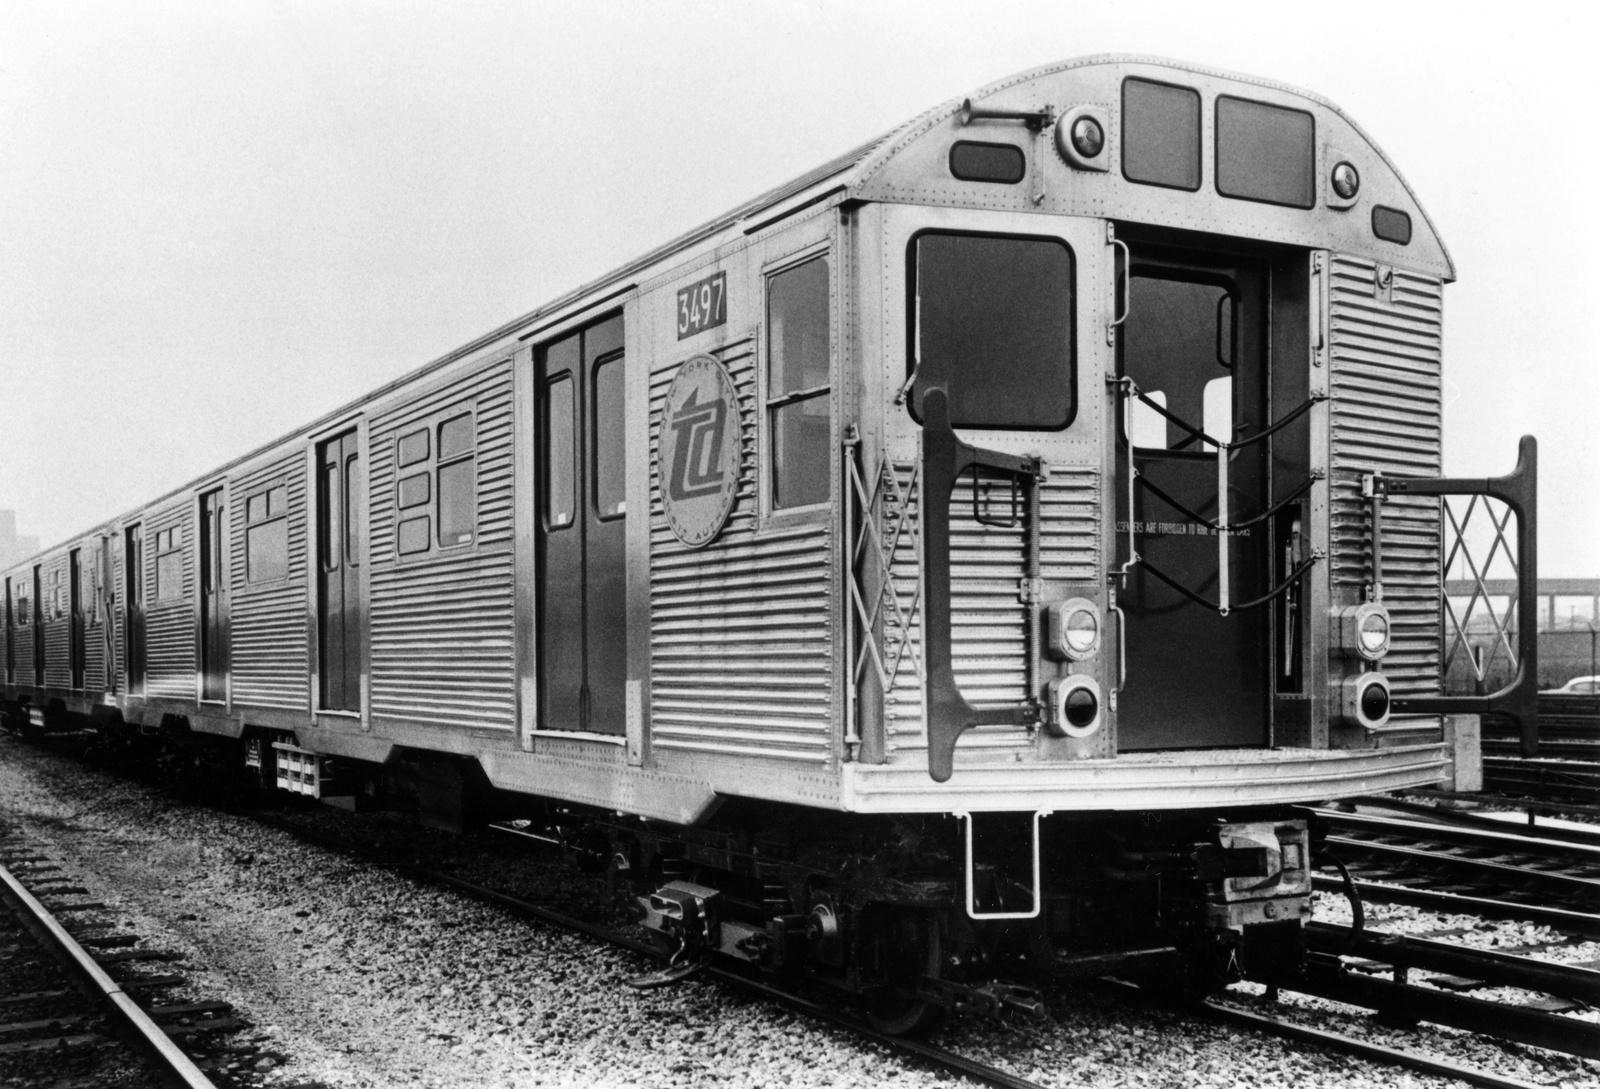 (266k, 1024x792)<br><b>Country:</b> United States<br><b>City:</b> New York<br><b>System:</b> New York City Transit<br><b>Location:</b> Coney Island Yard<br><b>Car:</b> R-32 (Budd, 1964)  3497 <br><b>Photo by:</b> Ed Watson/Arthur Lonto Collection<br><b>Collection of:</b> Frank Pfuhler<br><b>Date:</b> 1965<br><b>Viewed (this week/total):</b> 2 / 1015